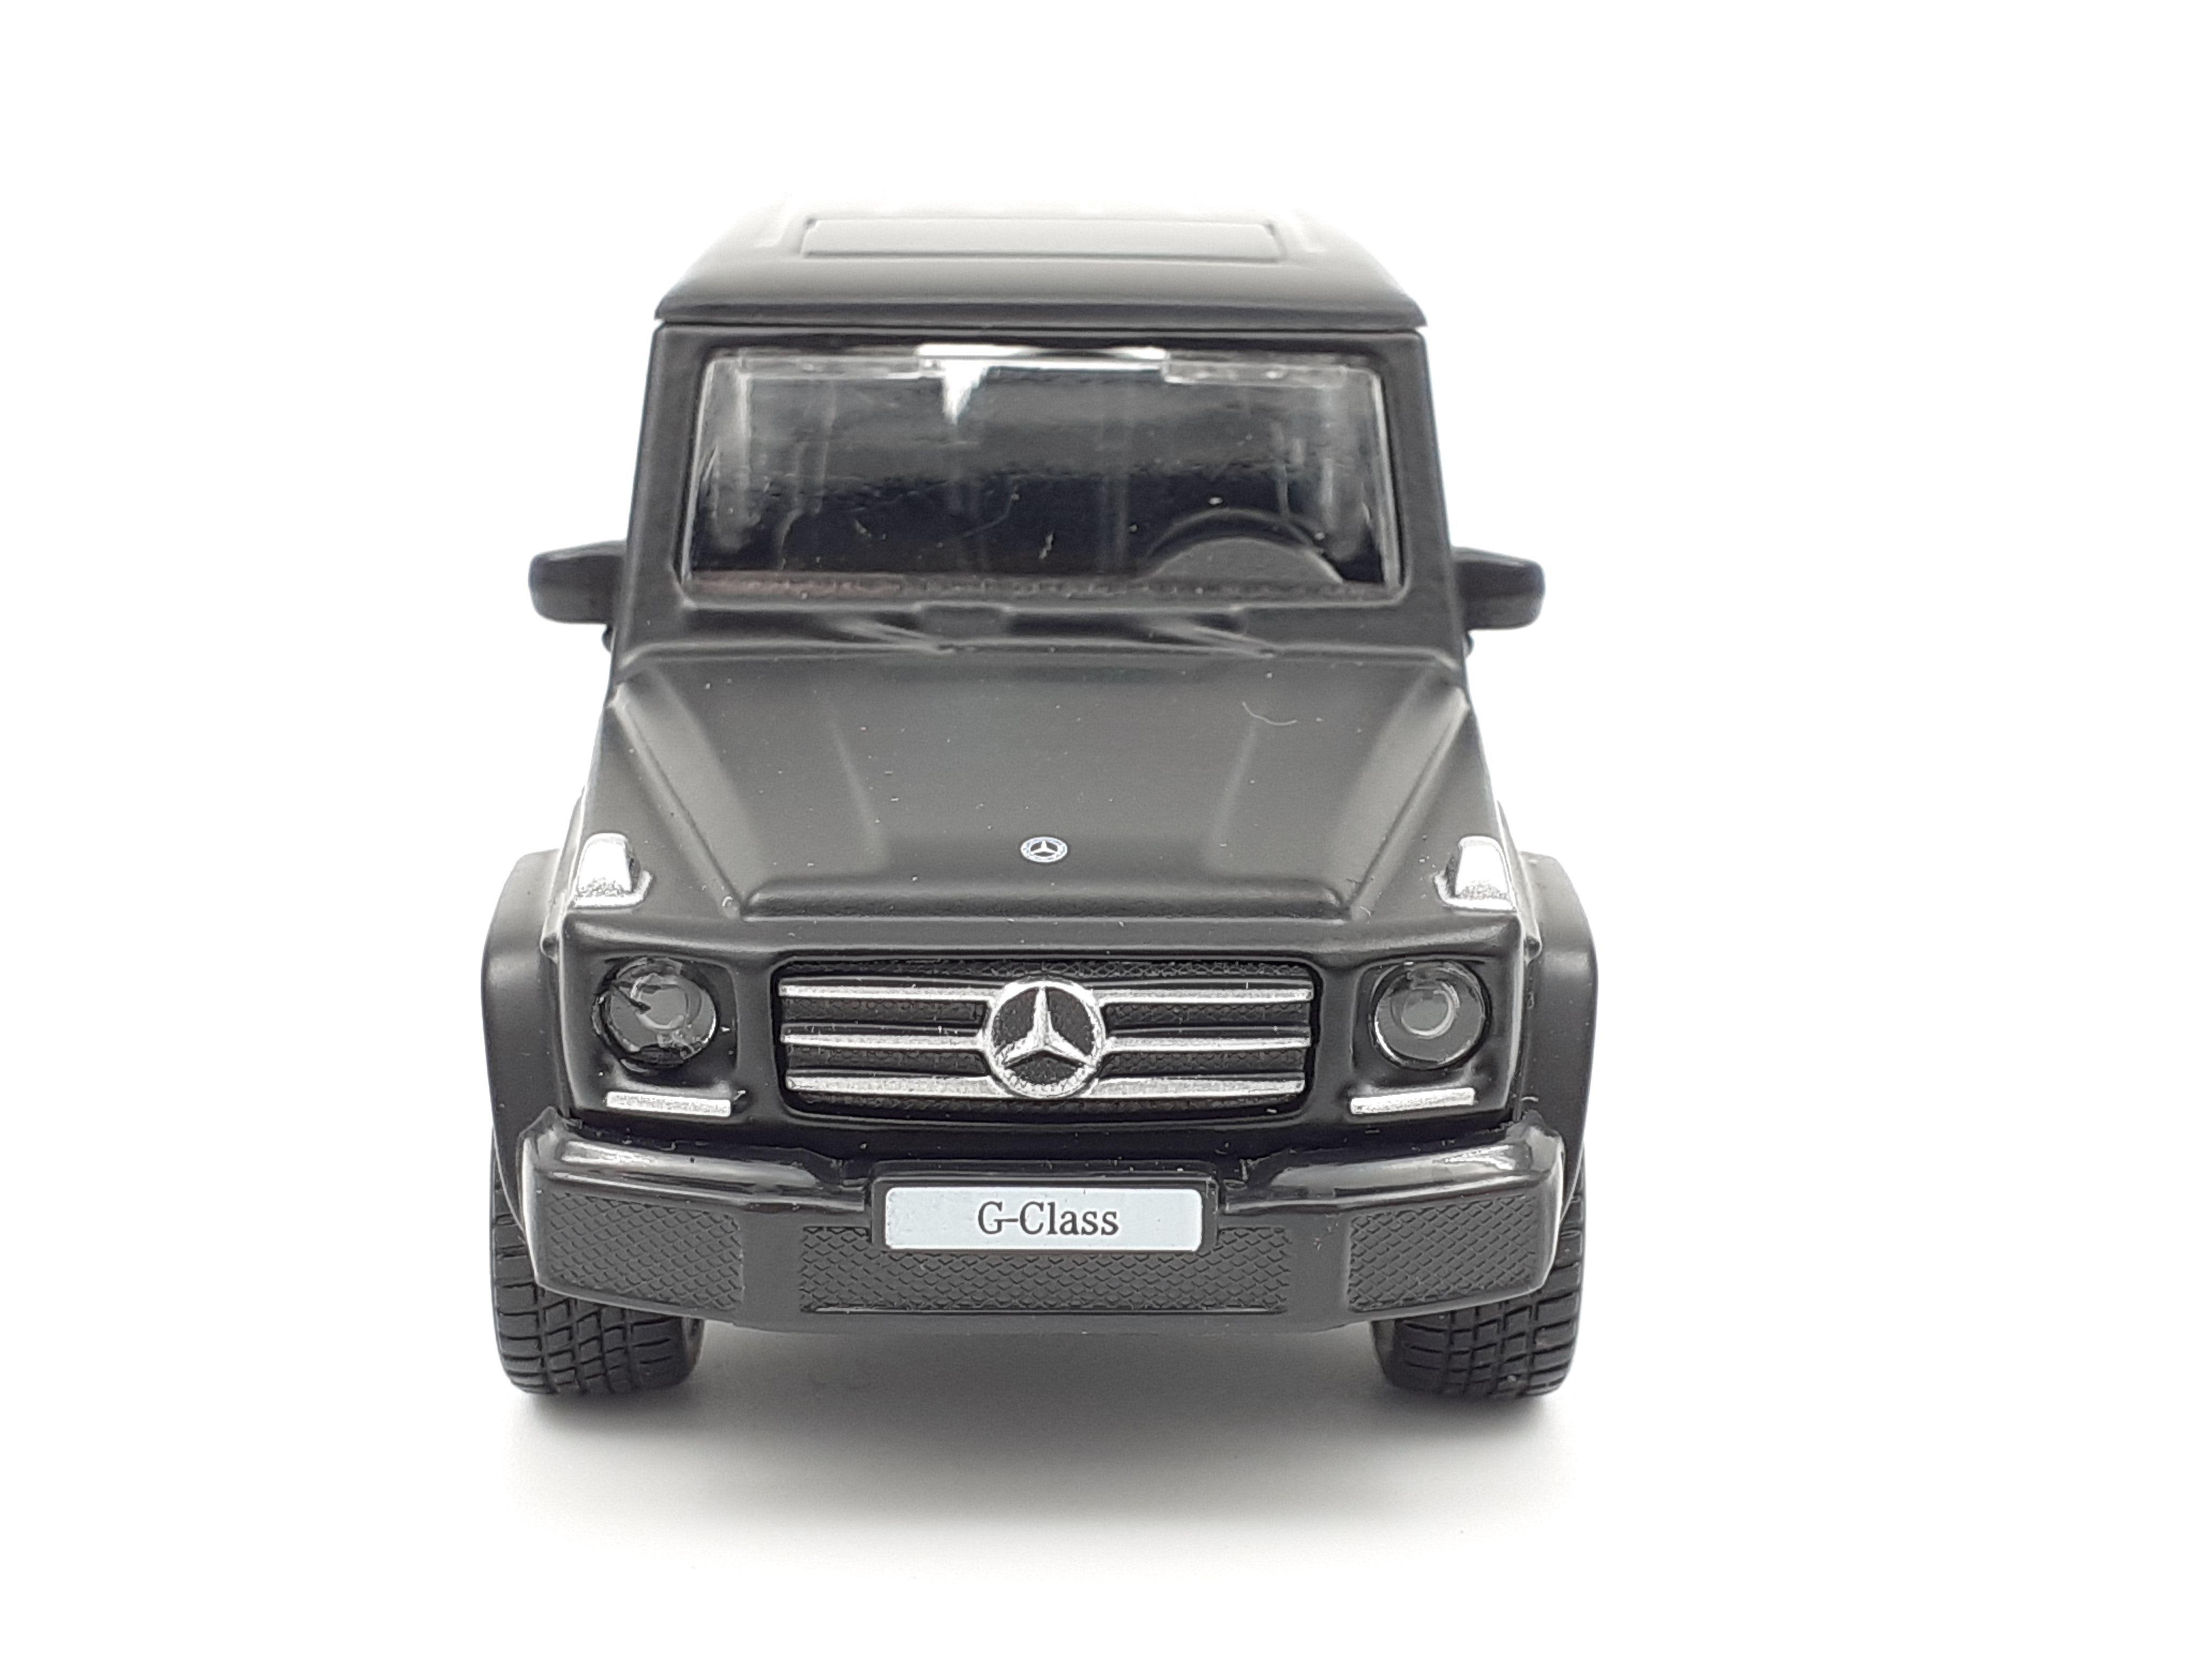 Maisto vozilo crni Mercedes G Class 1:41